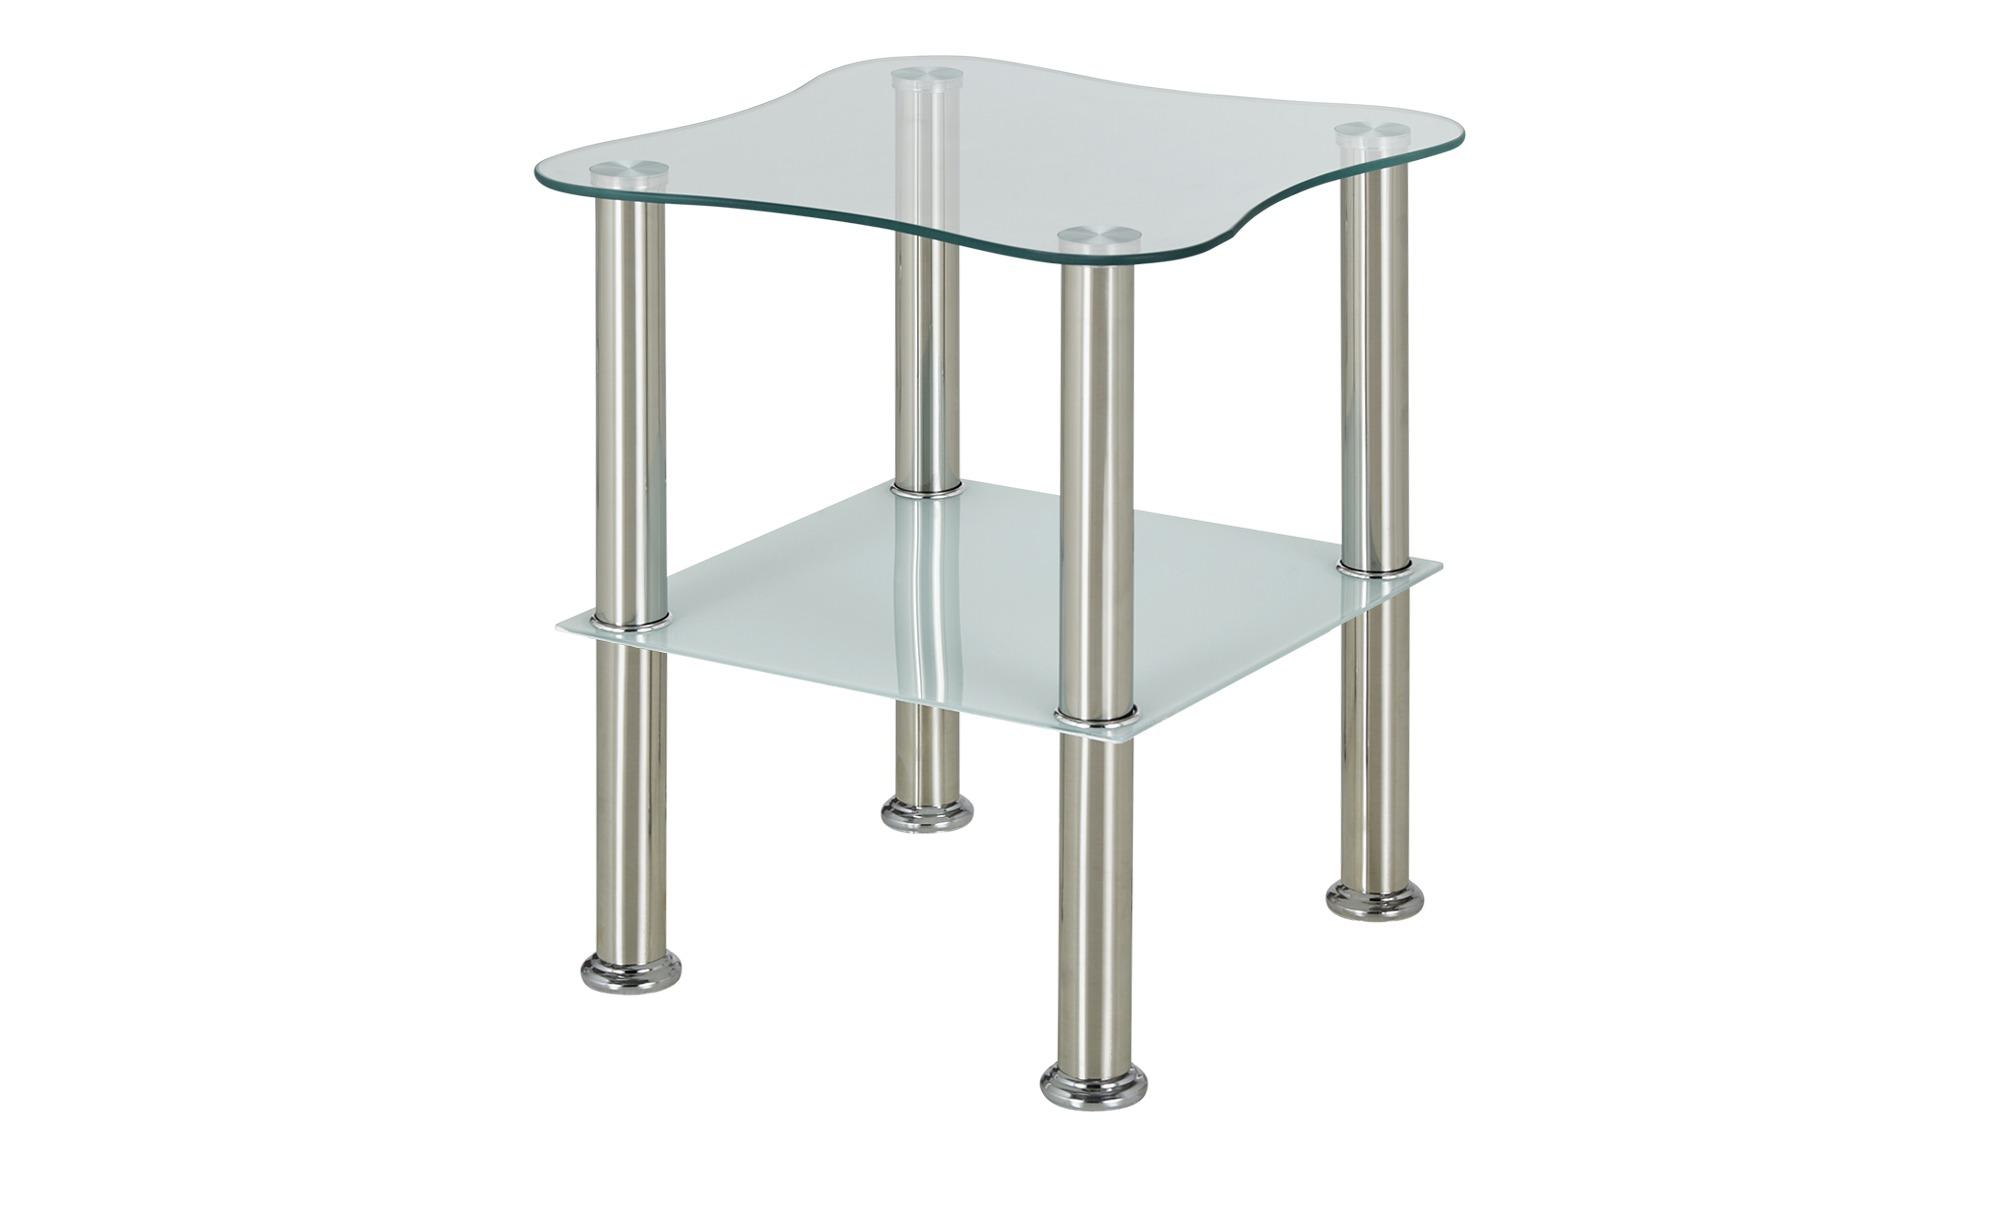 Transparentes Möbel mit Edelstahlgestell